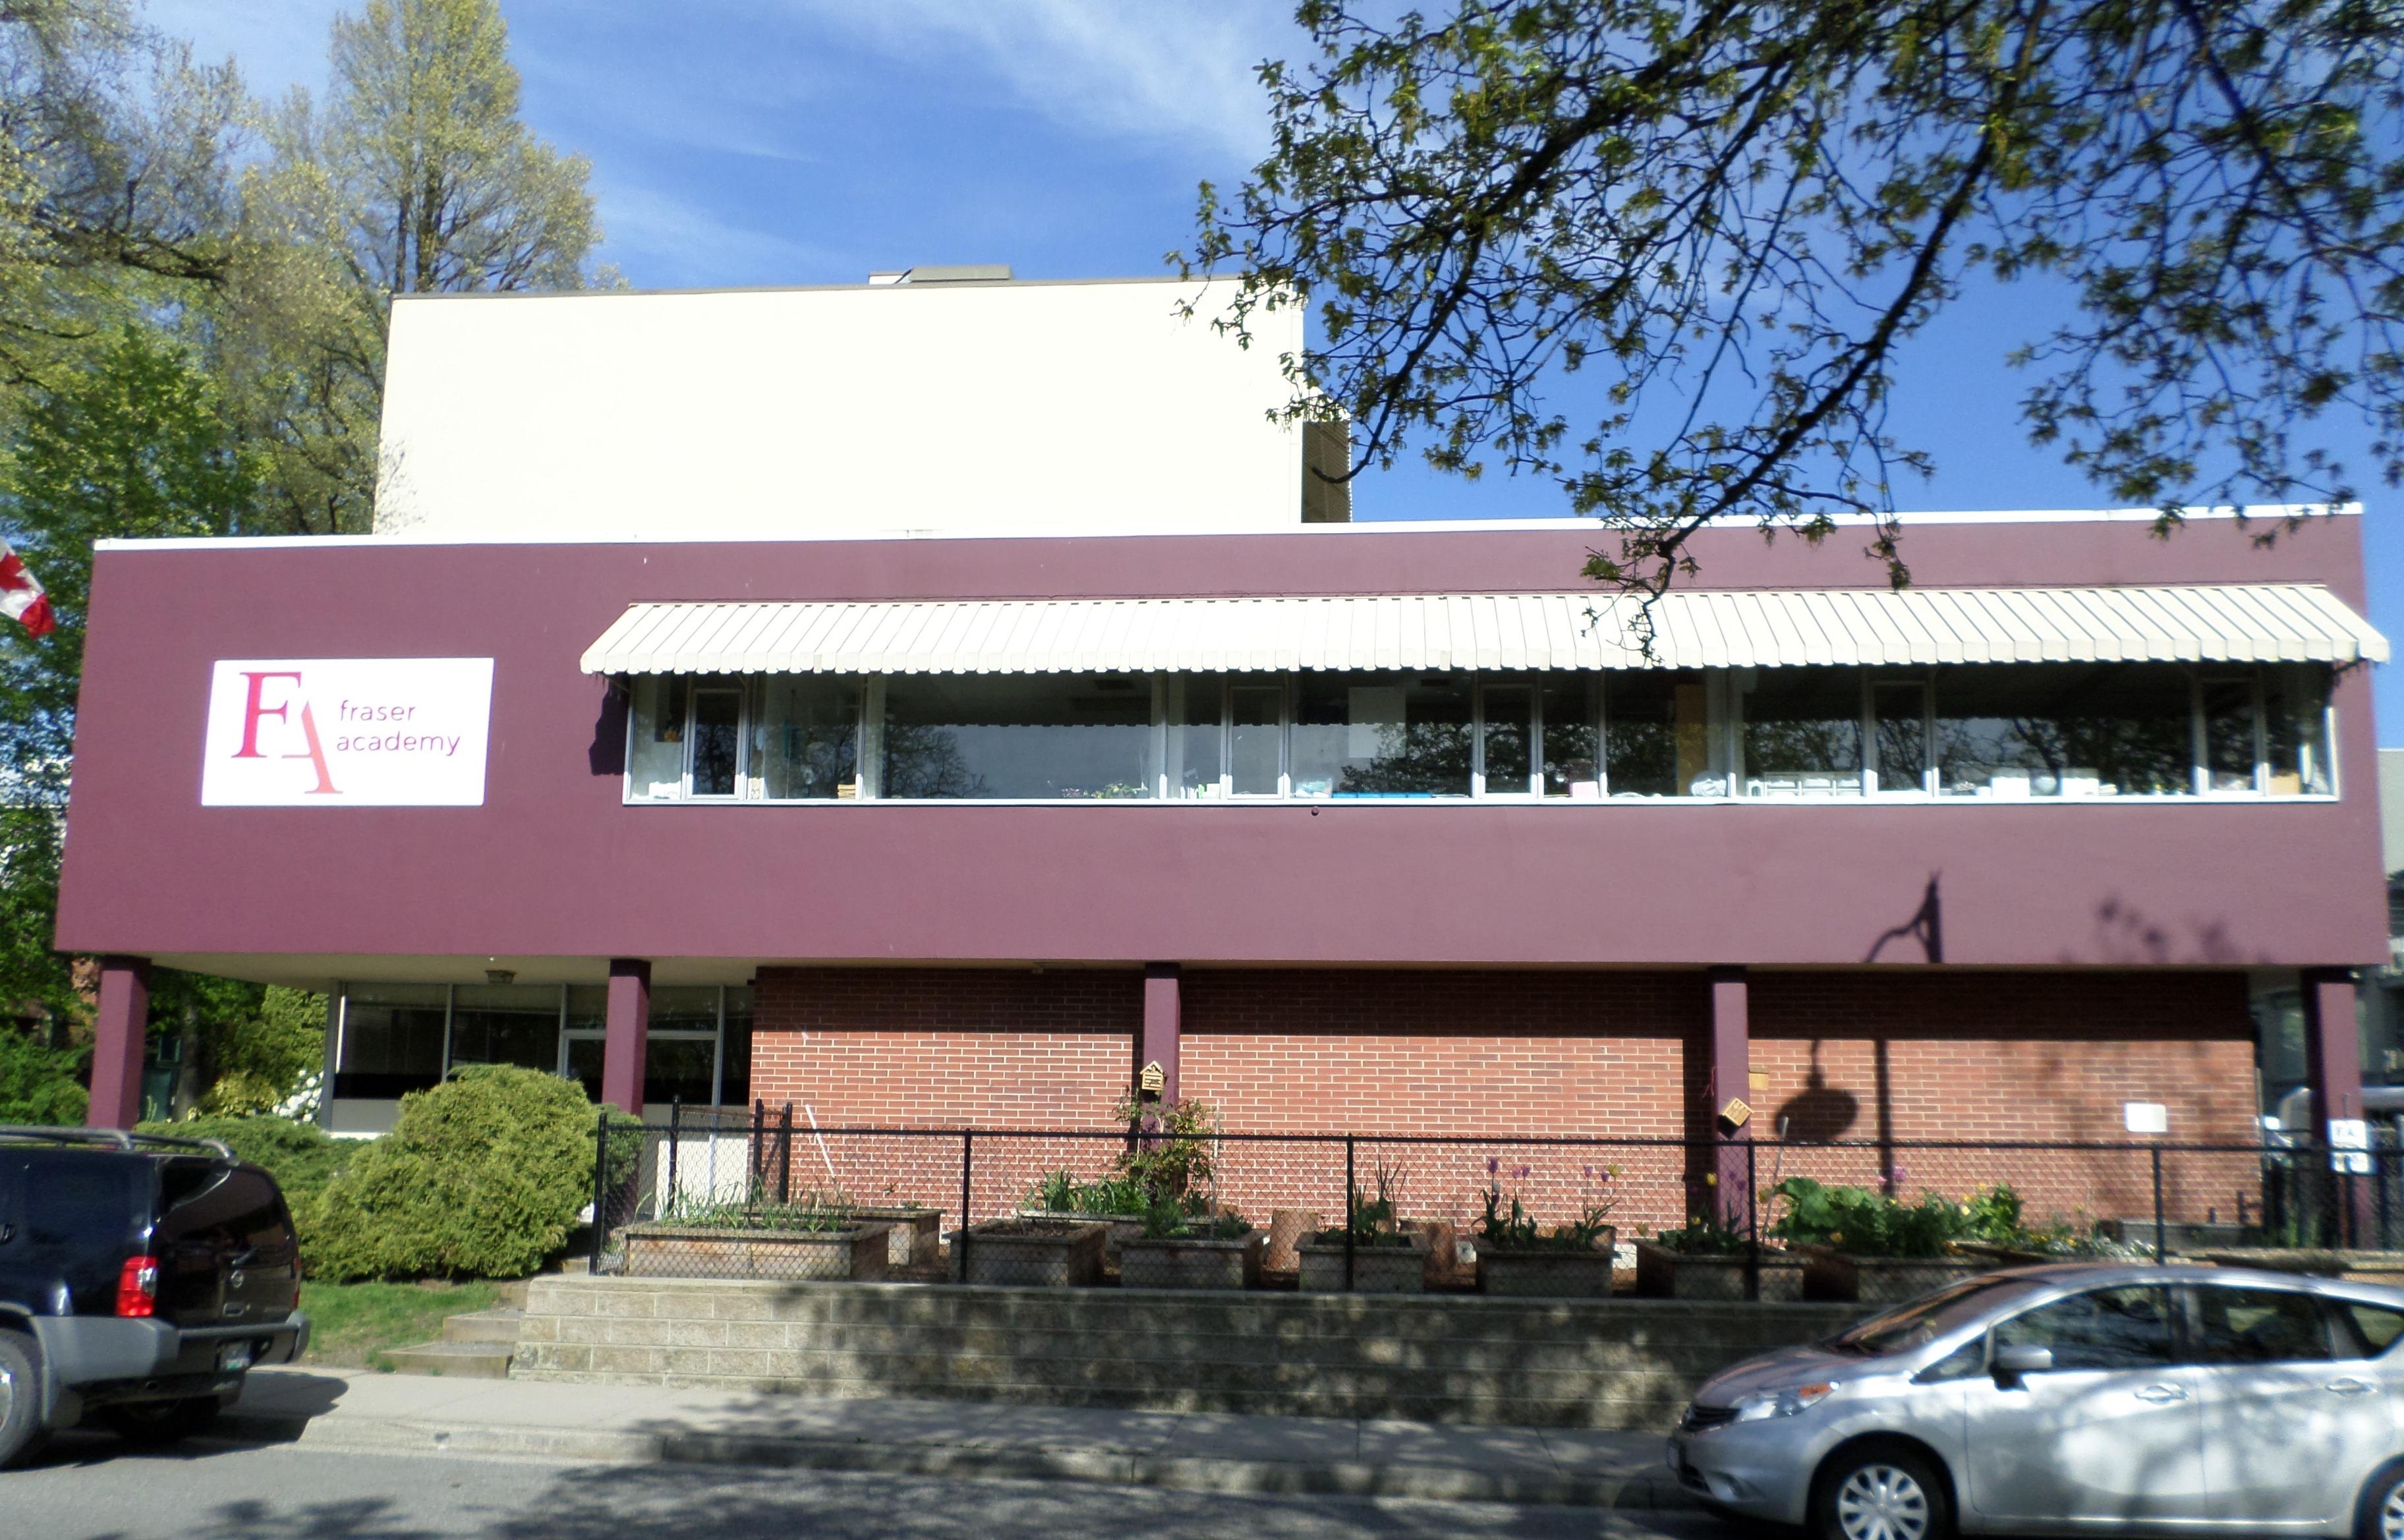 Fraser Academy - Wikipedia